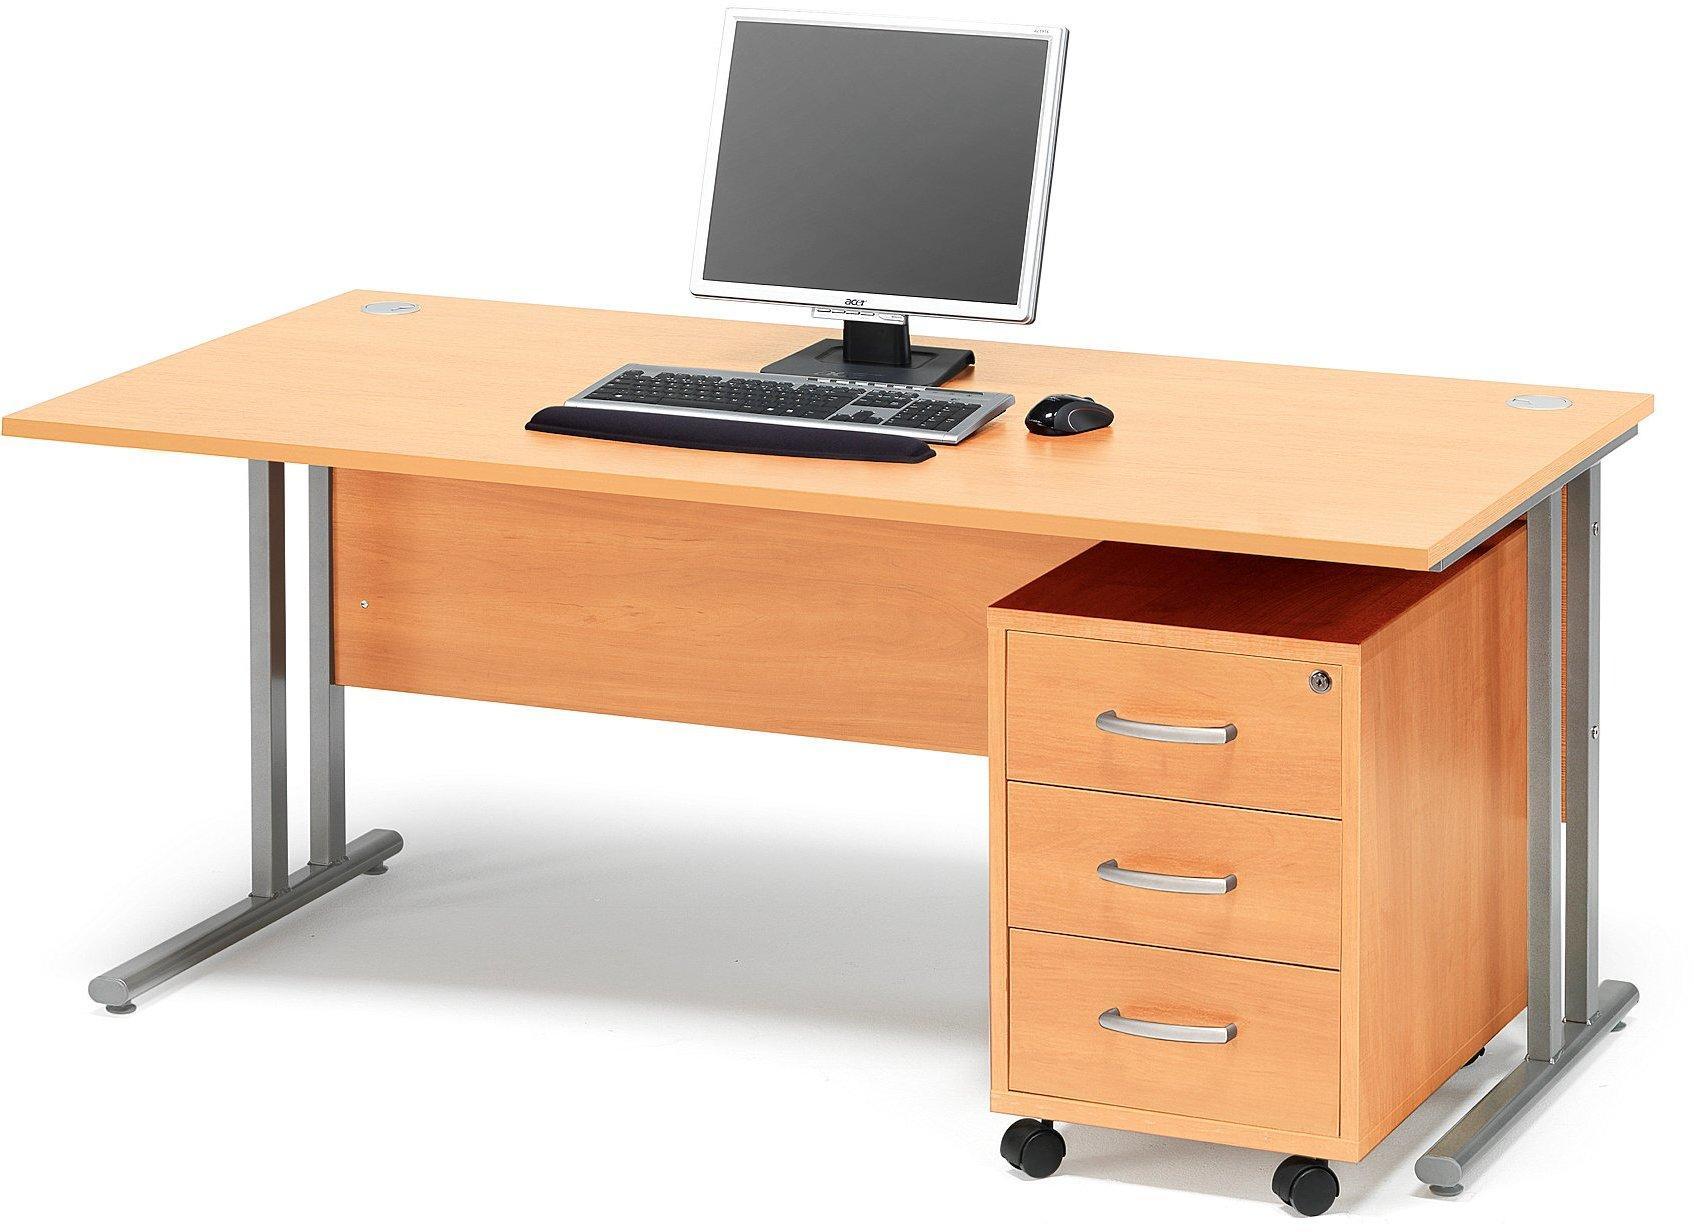 Kancelárska zostava Flexus: stôl 1600x800 mm + kancelársky kontajner, buk